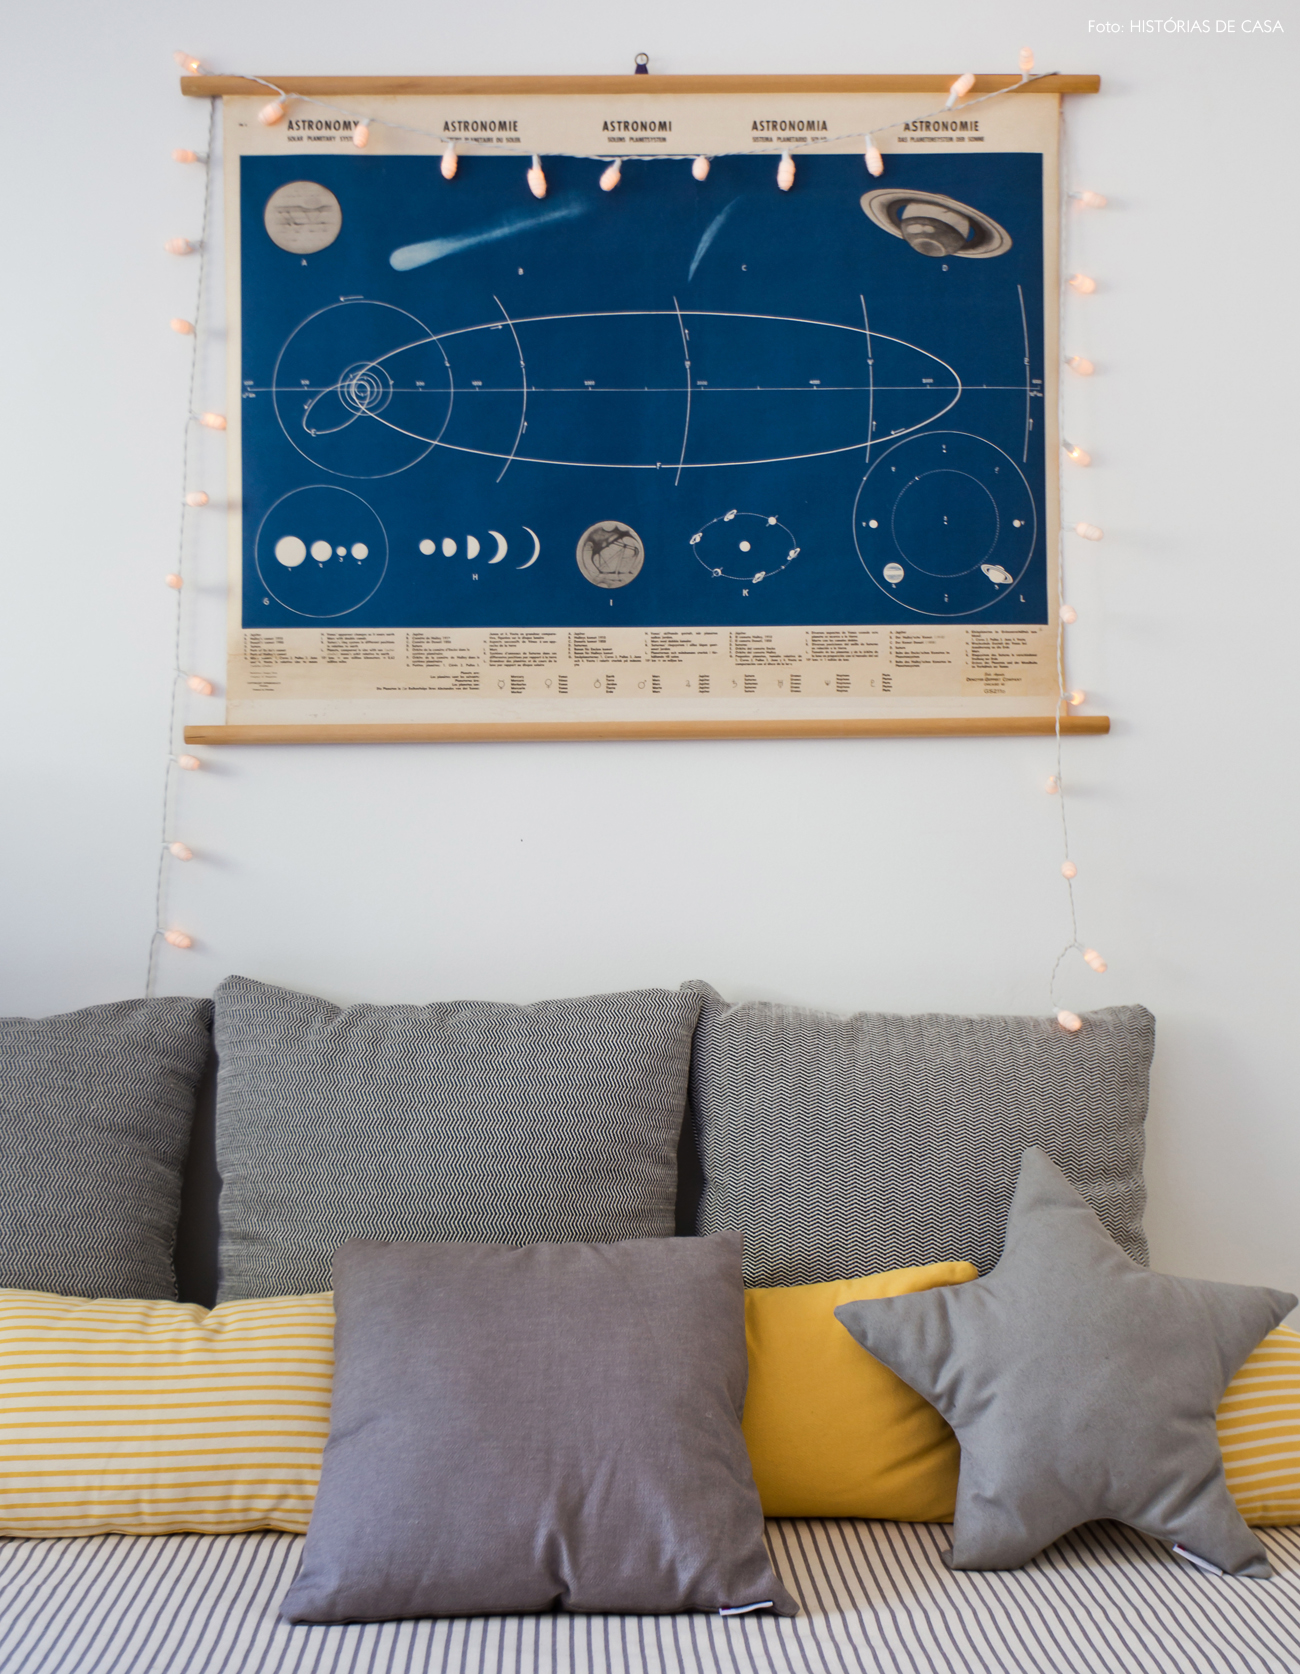 36-decoracao-quarto-bebe-cama-baixa-almofadas-estampadas